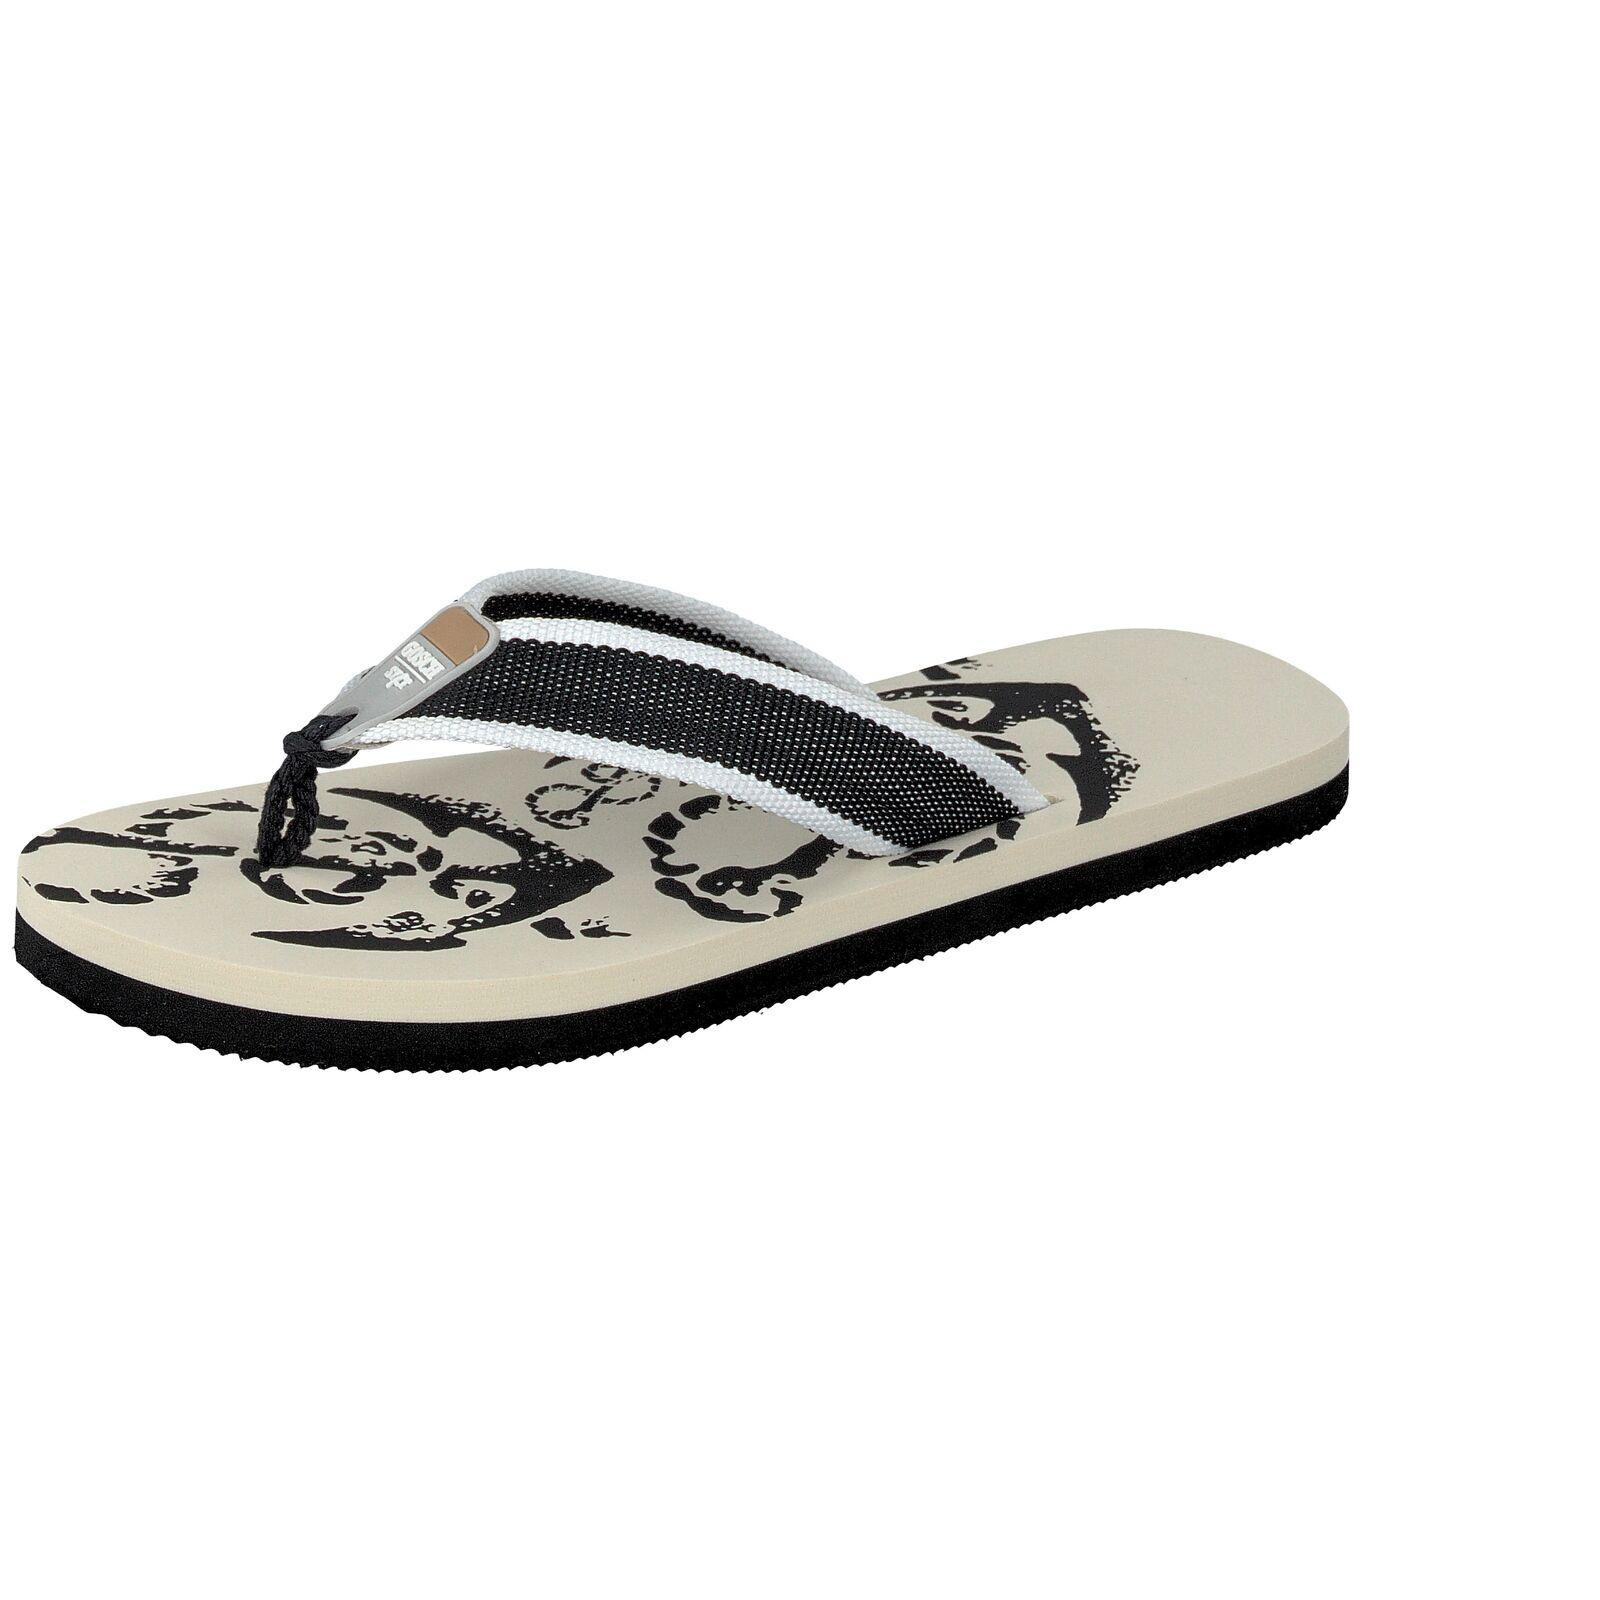 Gosch Shoes Sylt Herren Schuhe Zehentrenner Sommer Badeschuhe 8107-702 Schwarz